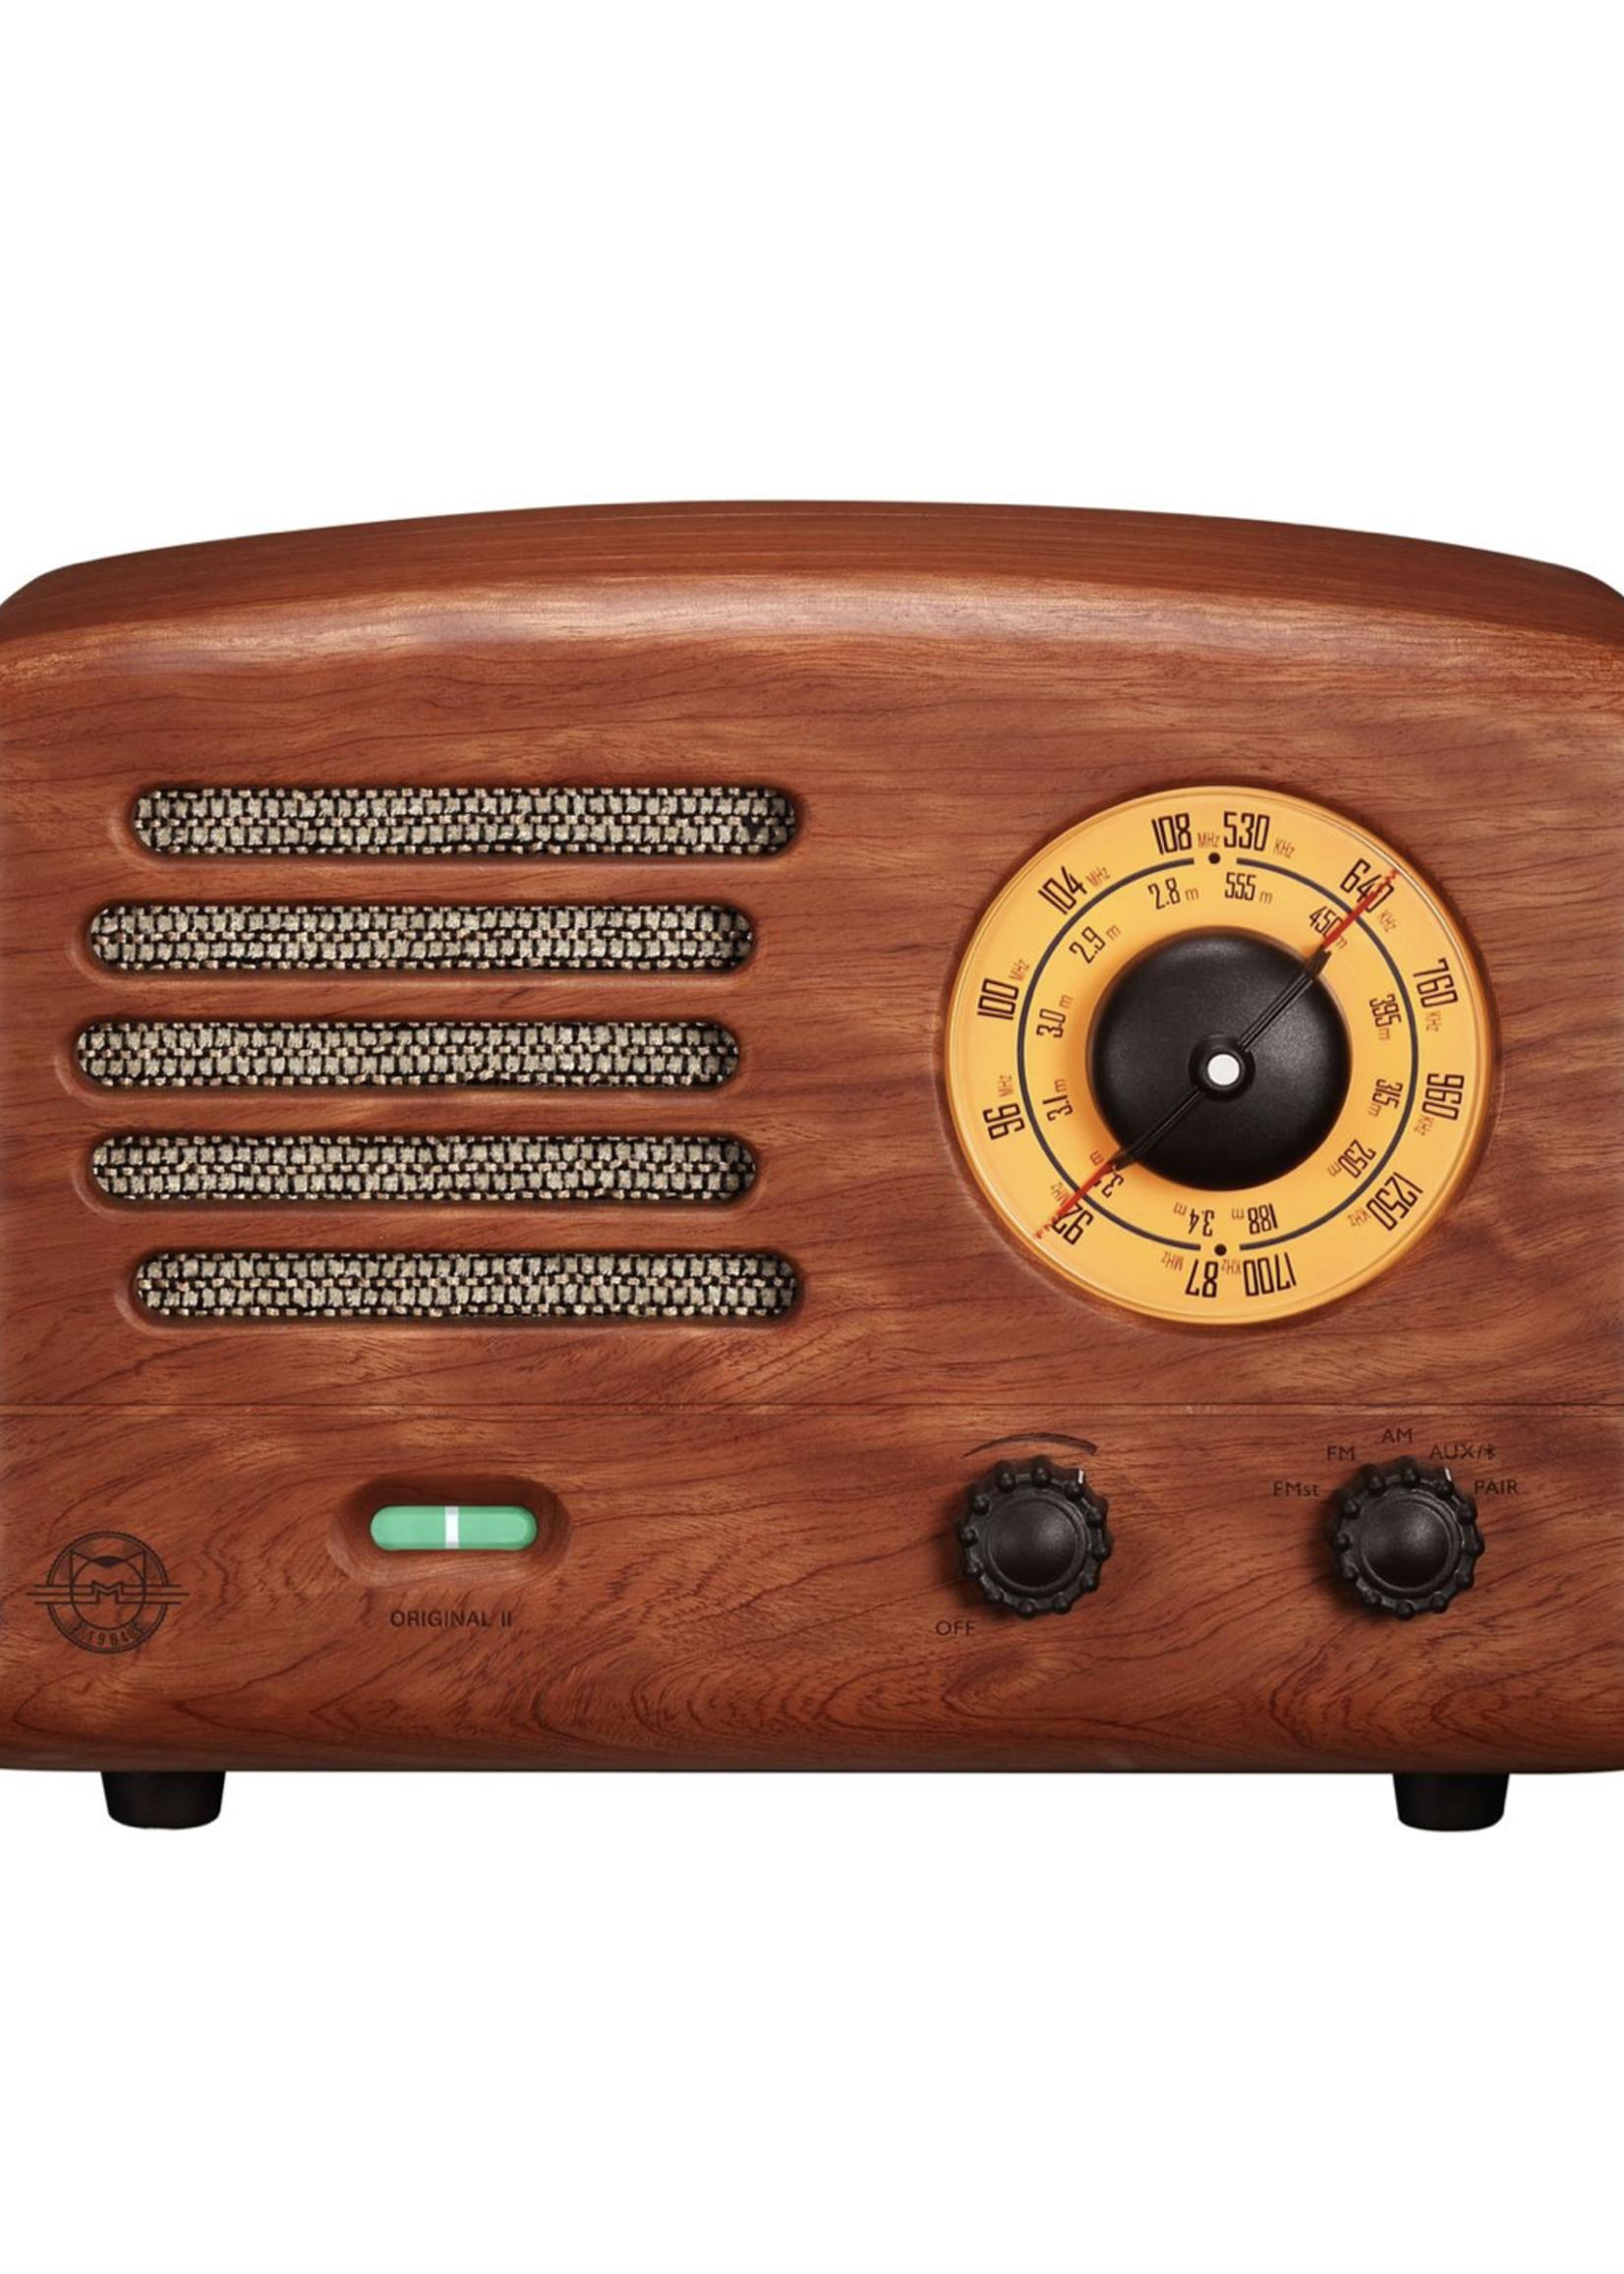 Muzen Muzen Bluetooth Speaker Original II Walnut Wood